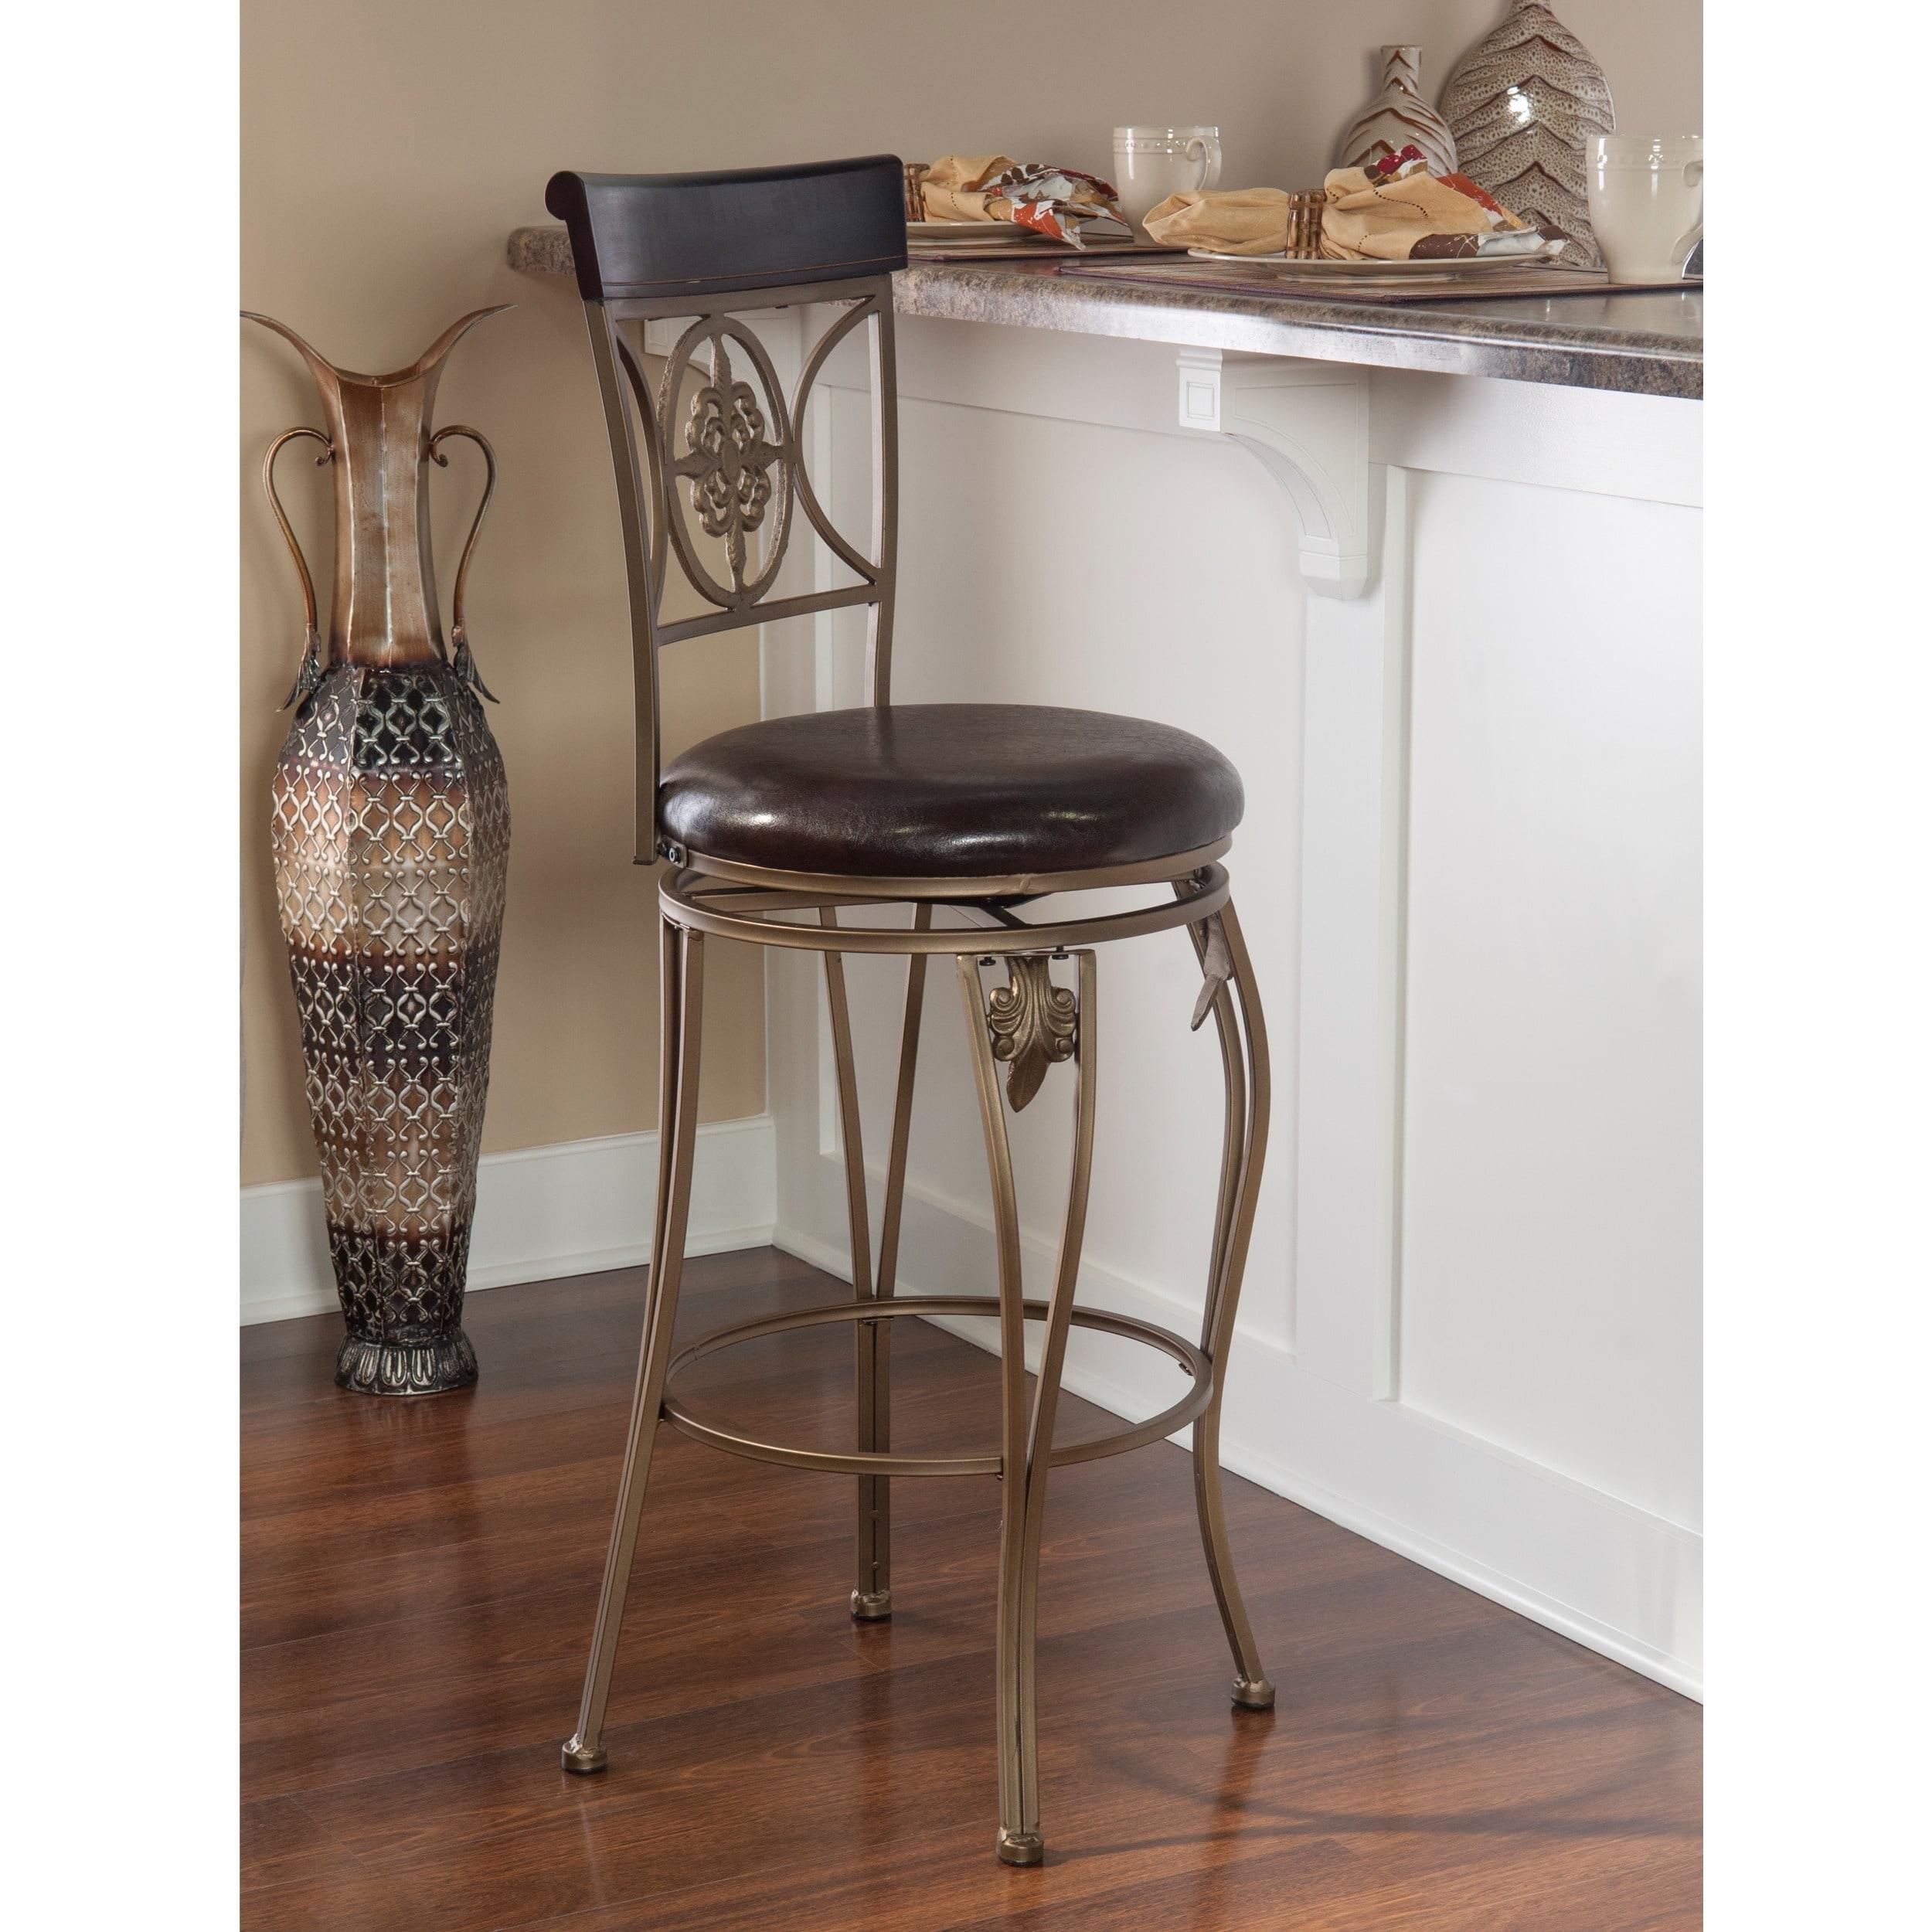 fleur de lis bar stools. Linon Lily Flower Bar Stool, Distressed Brown PVC - Free Shipping Today Overstock 15882429 Fleur De Lis Stools